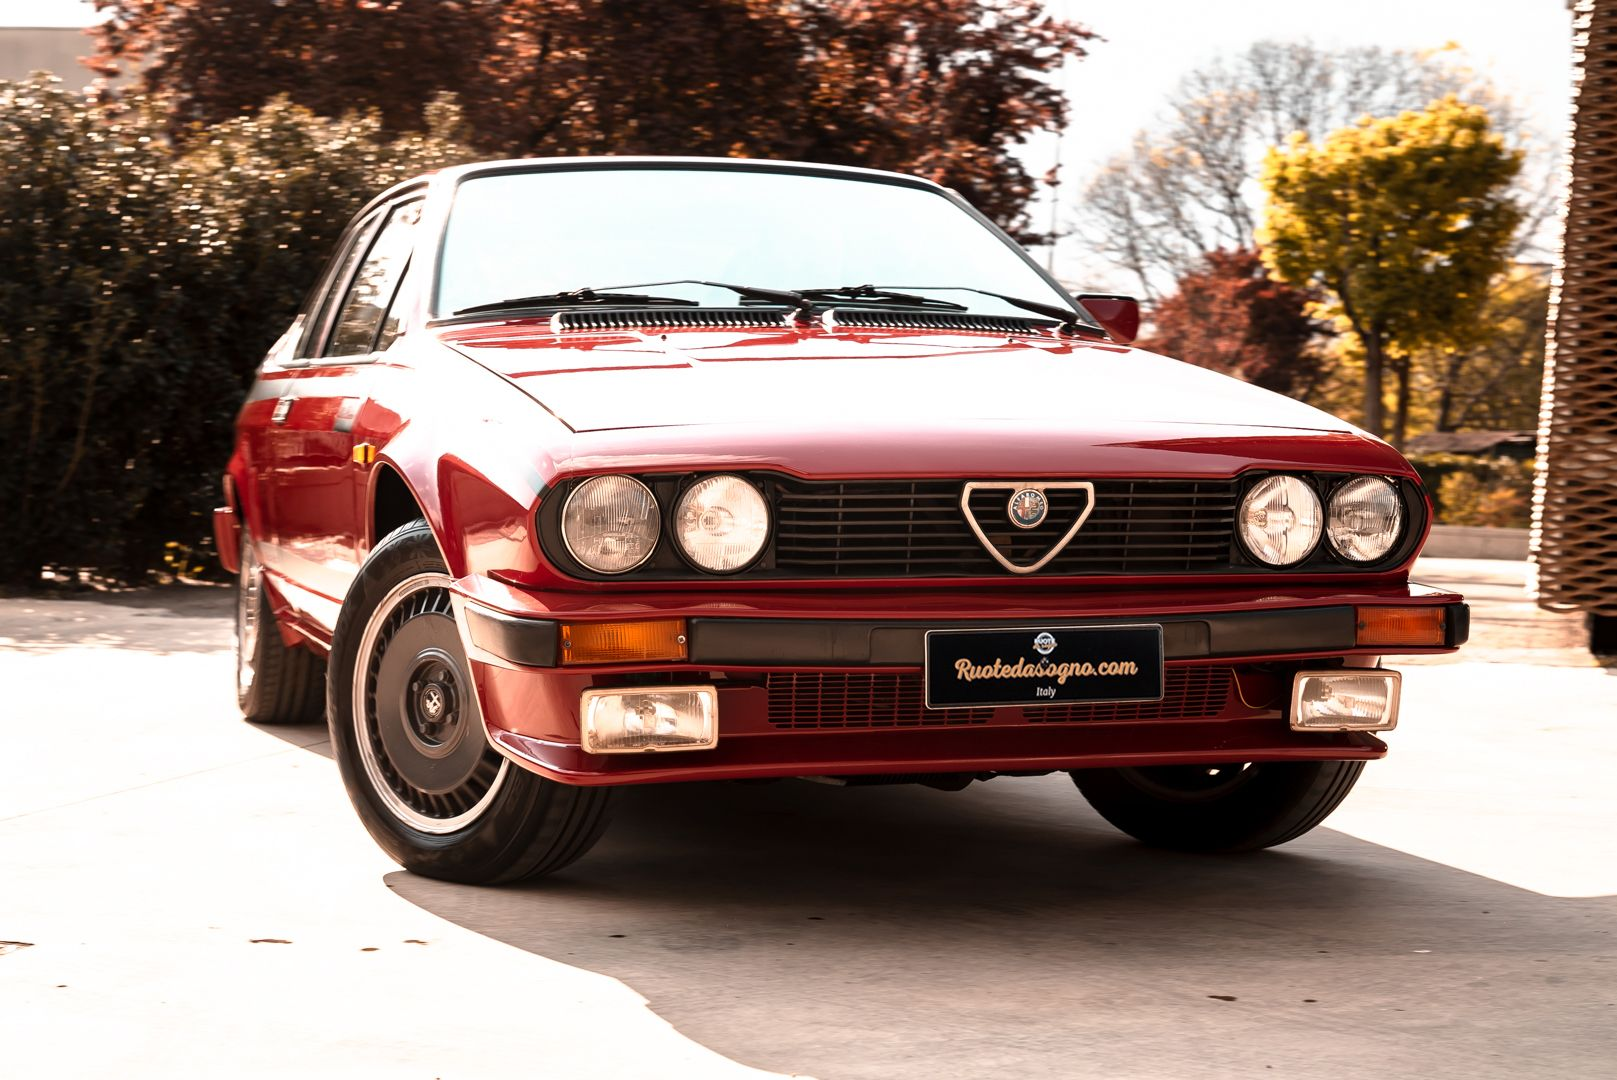 1981 Alfa Romeo Alfetta GTV Gran Prix n.128 68566